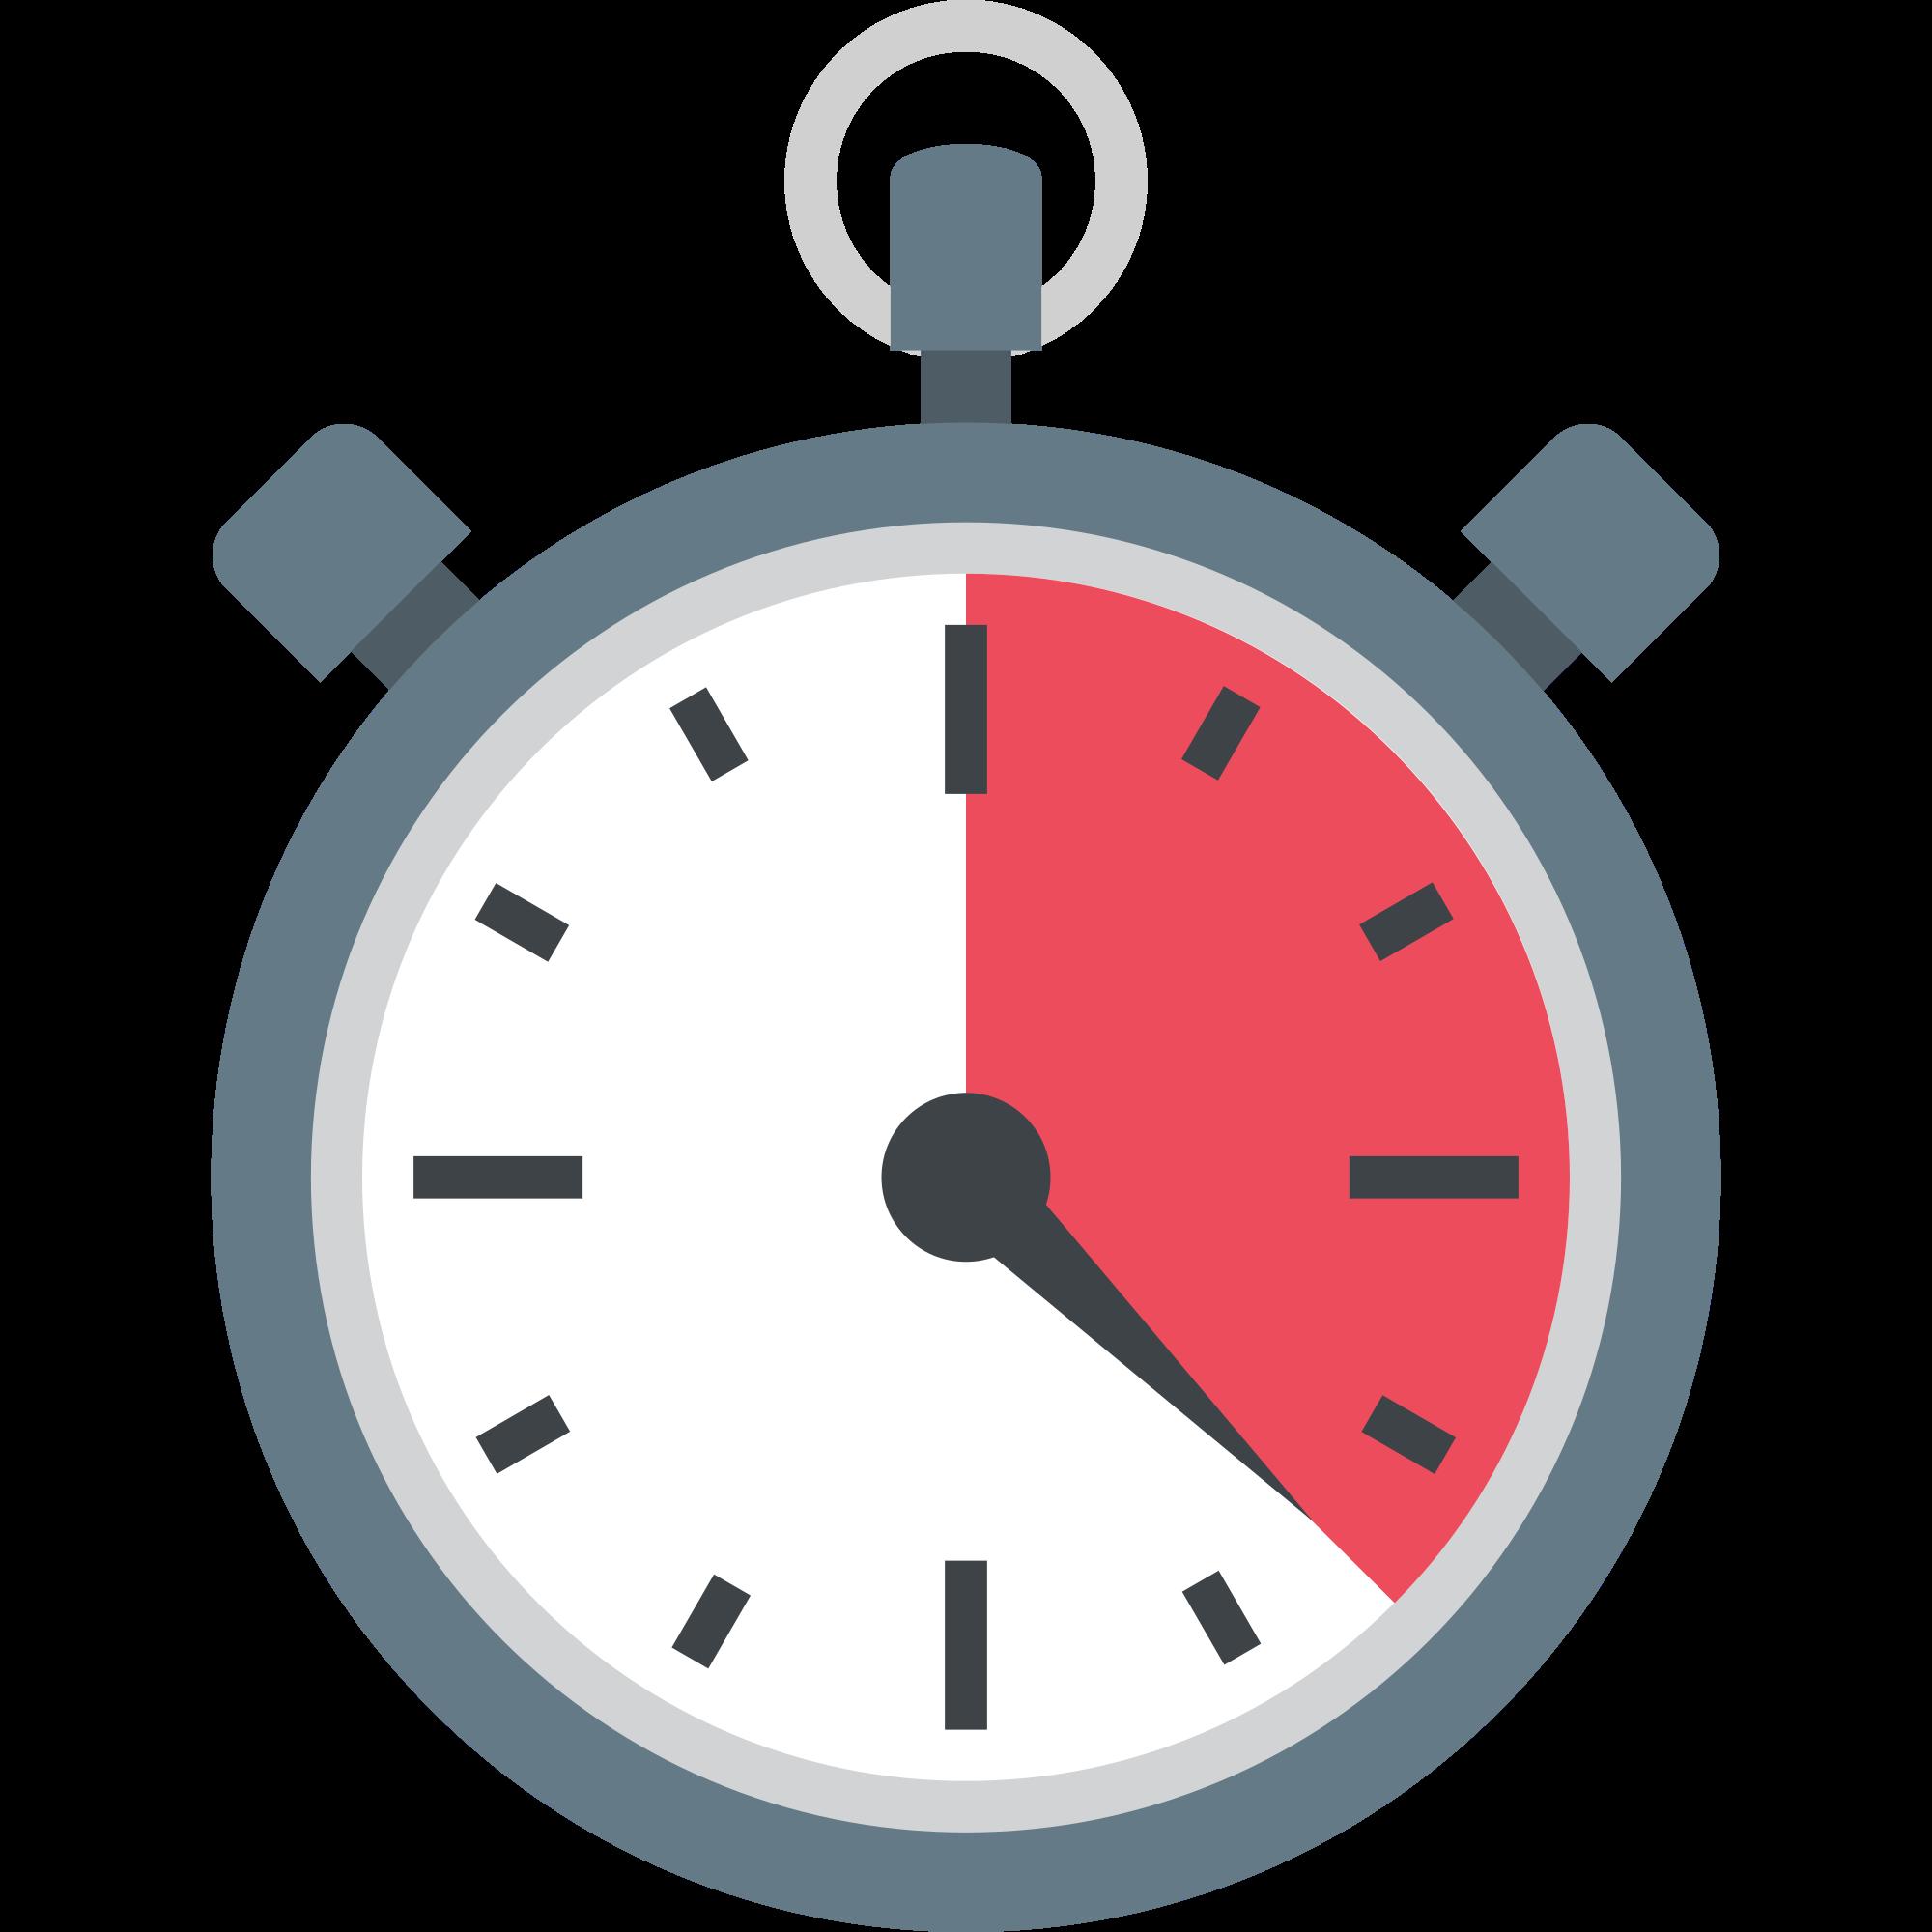 Stopwatch clipart emoji. File emojione f svg